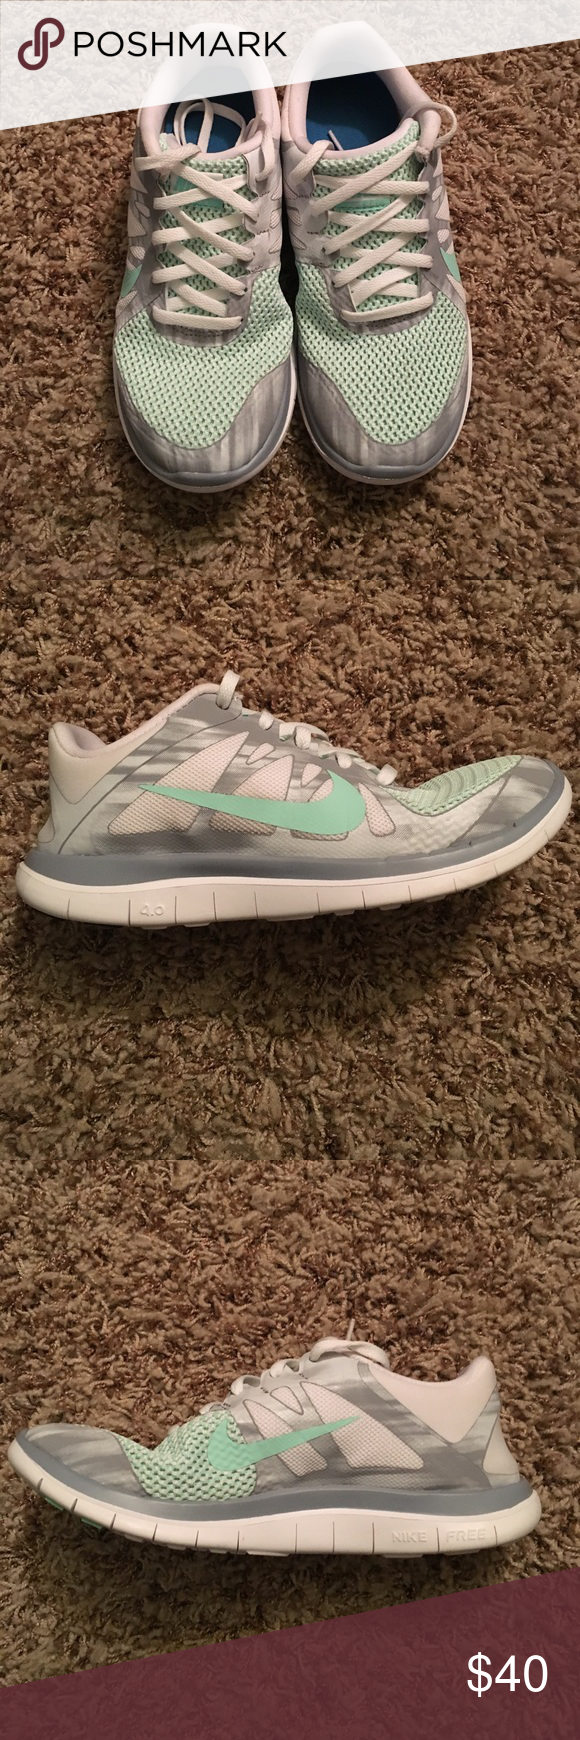 Nike Free 4.0 | Nike free, Nike, Sneakers